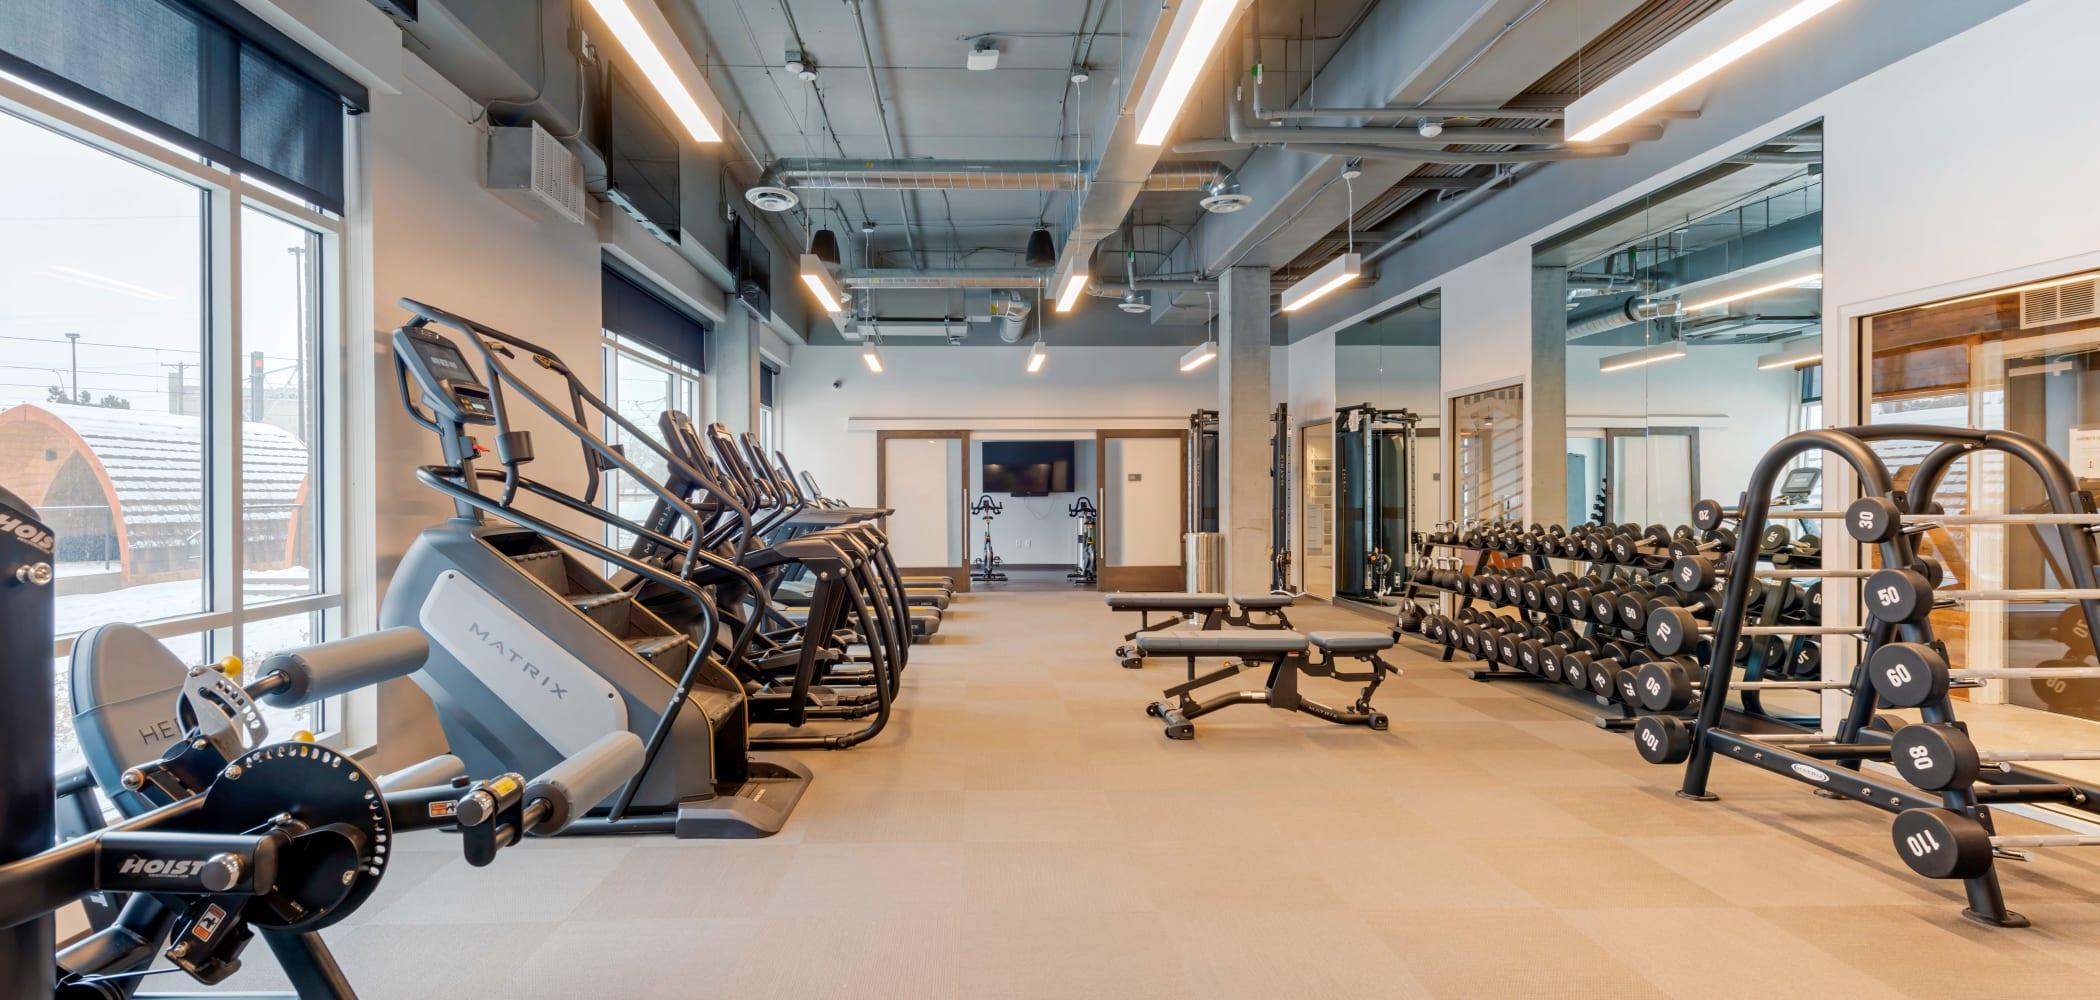 Fitness center at HERE Minneapolis in Minneapolis, Minnesota